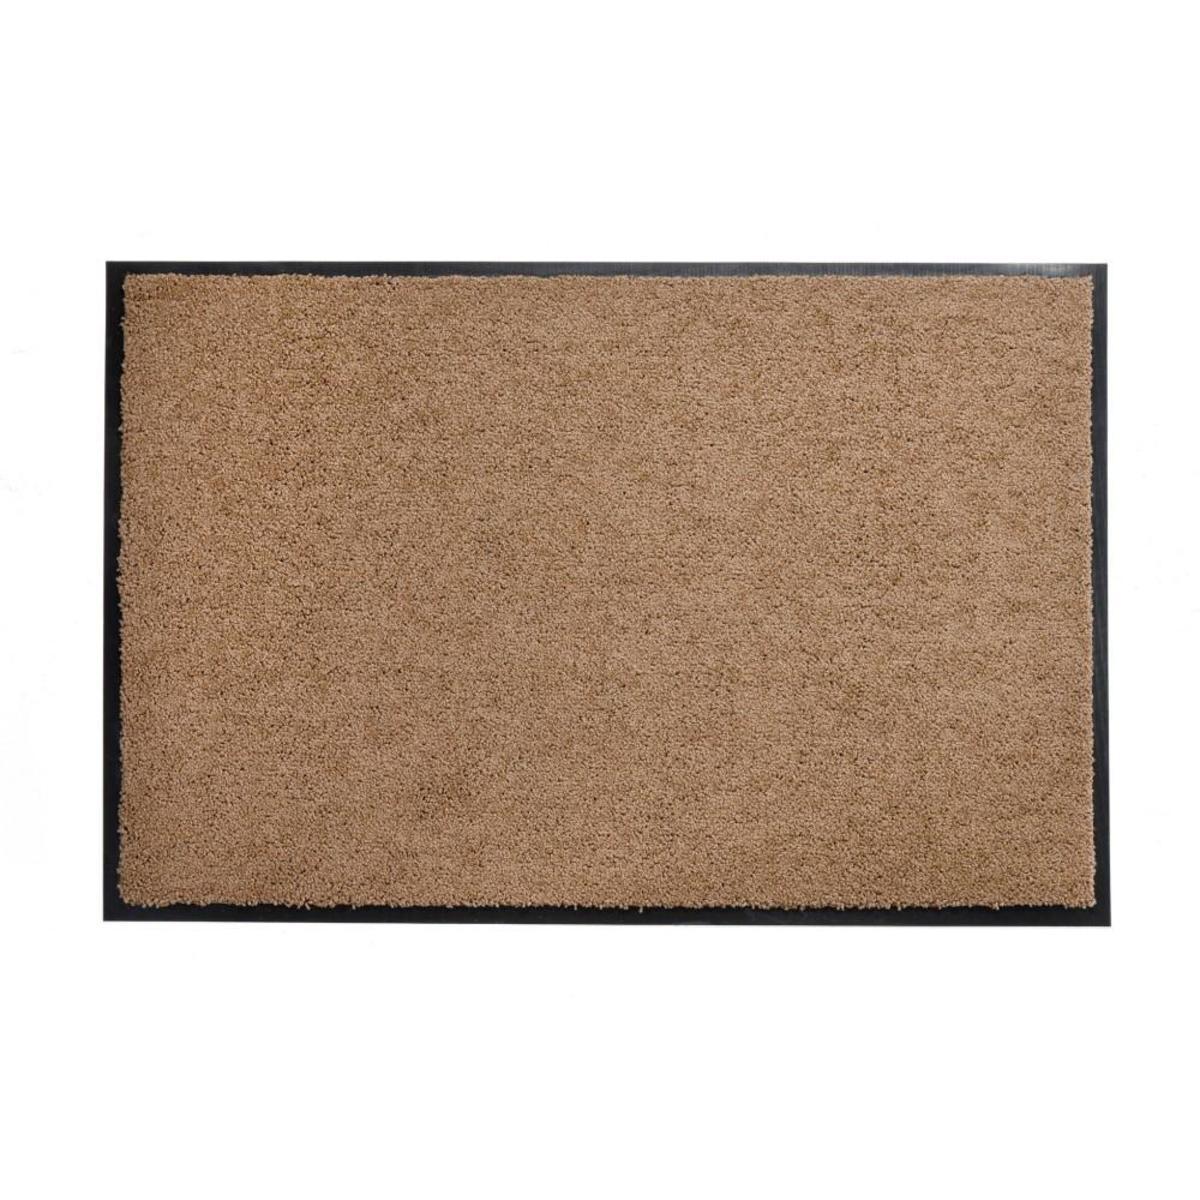 Bild 1 von acerto® EVODIA Premium Schmutzfangmatte Lavendel-Duft taupe - 60x120cm